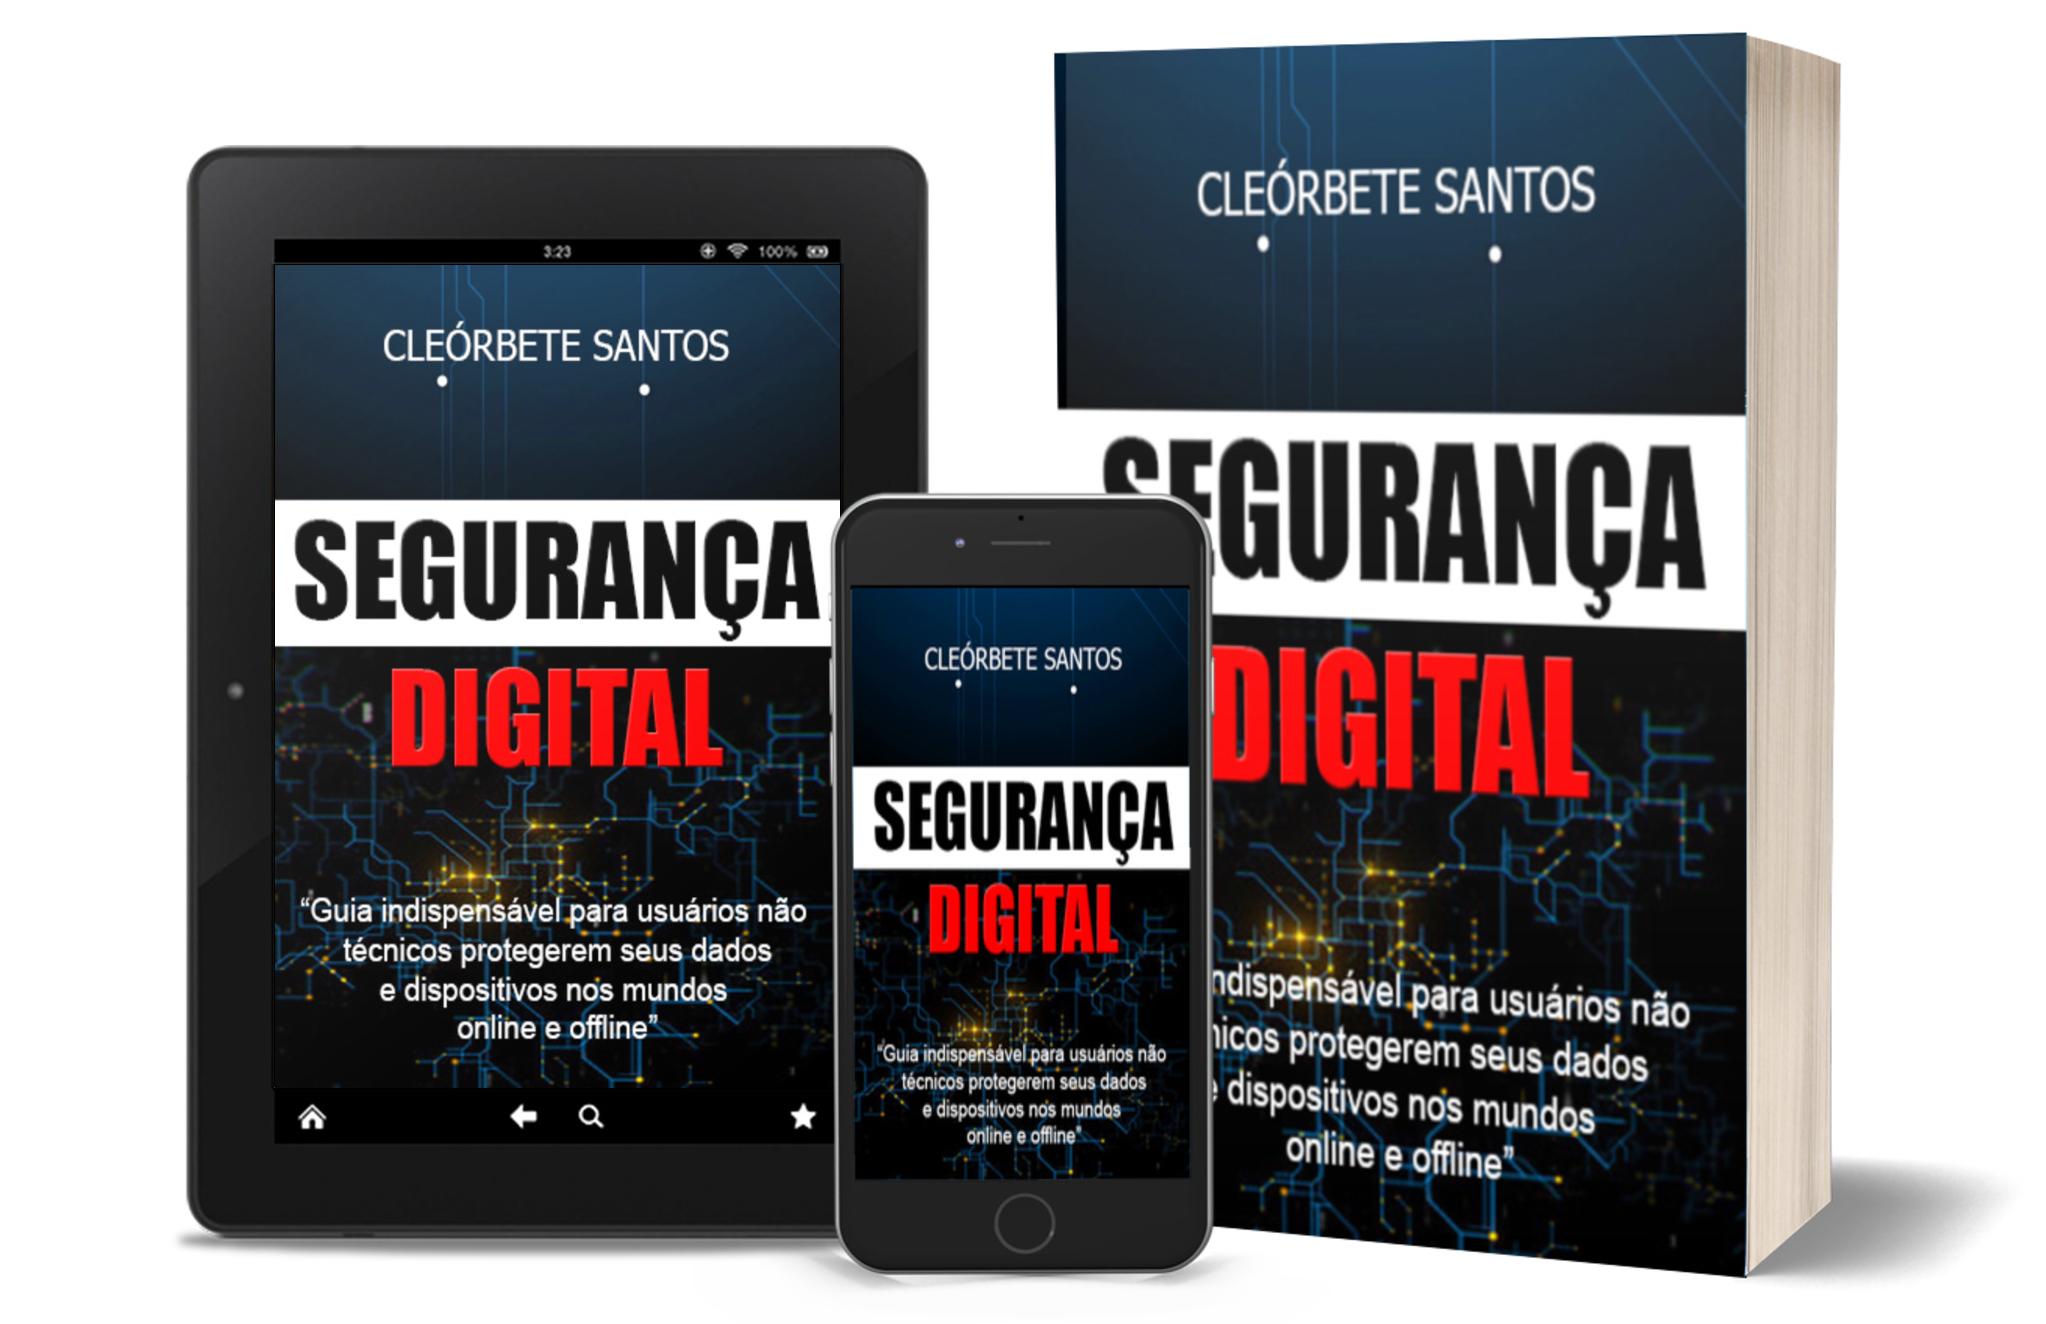 seguranca-digital-cleorbete